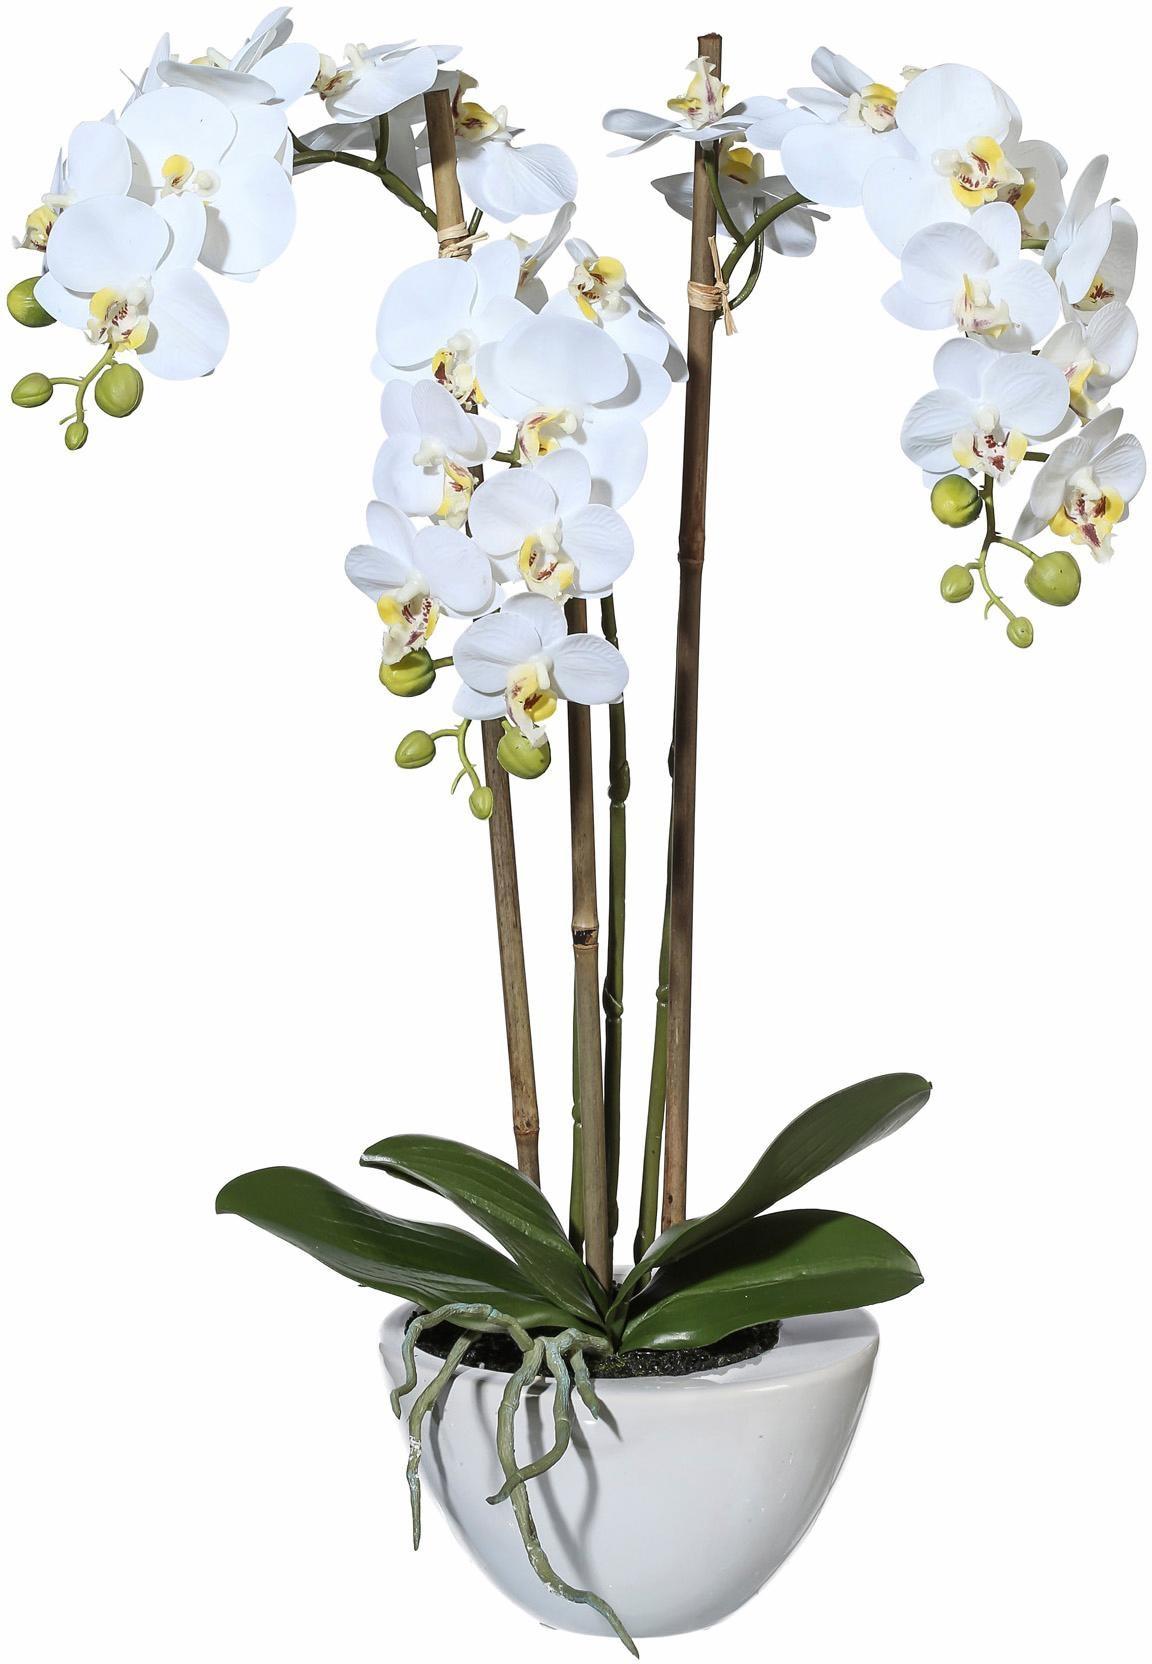 Kunstpflanze Mini Orchidee Technik & Freizeit/Heimwerken & Garten/Garten & Balkon/Pflanzen/Kunstpflanzen/Kunst-Orchideen